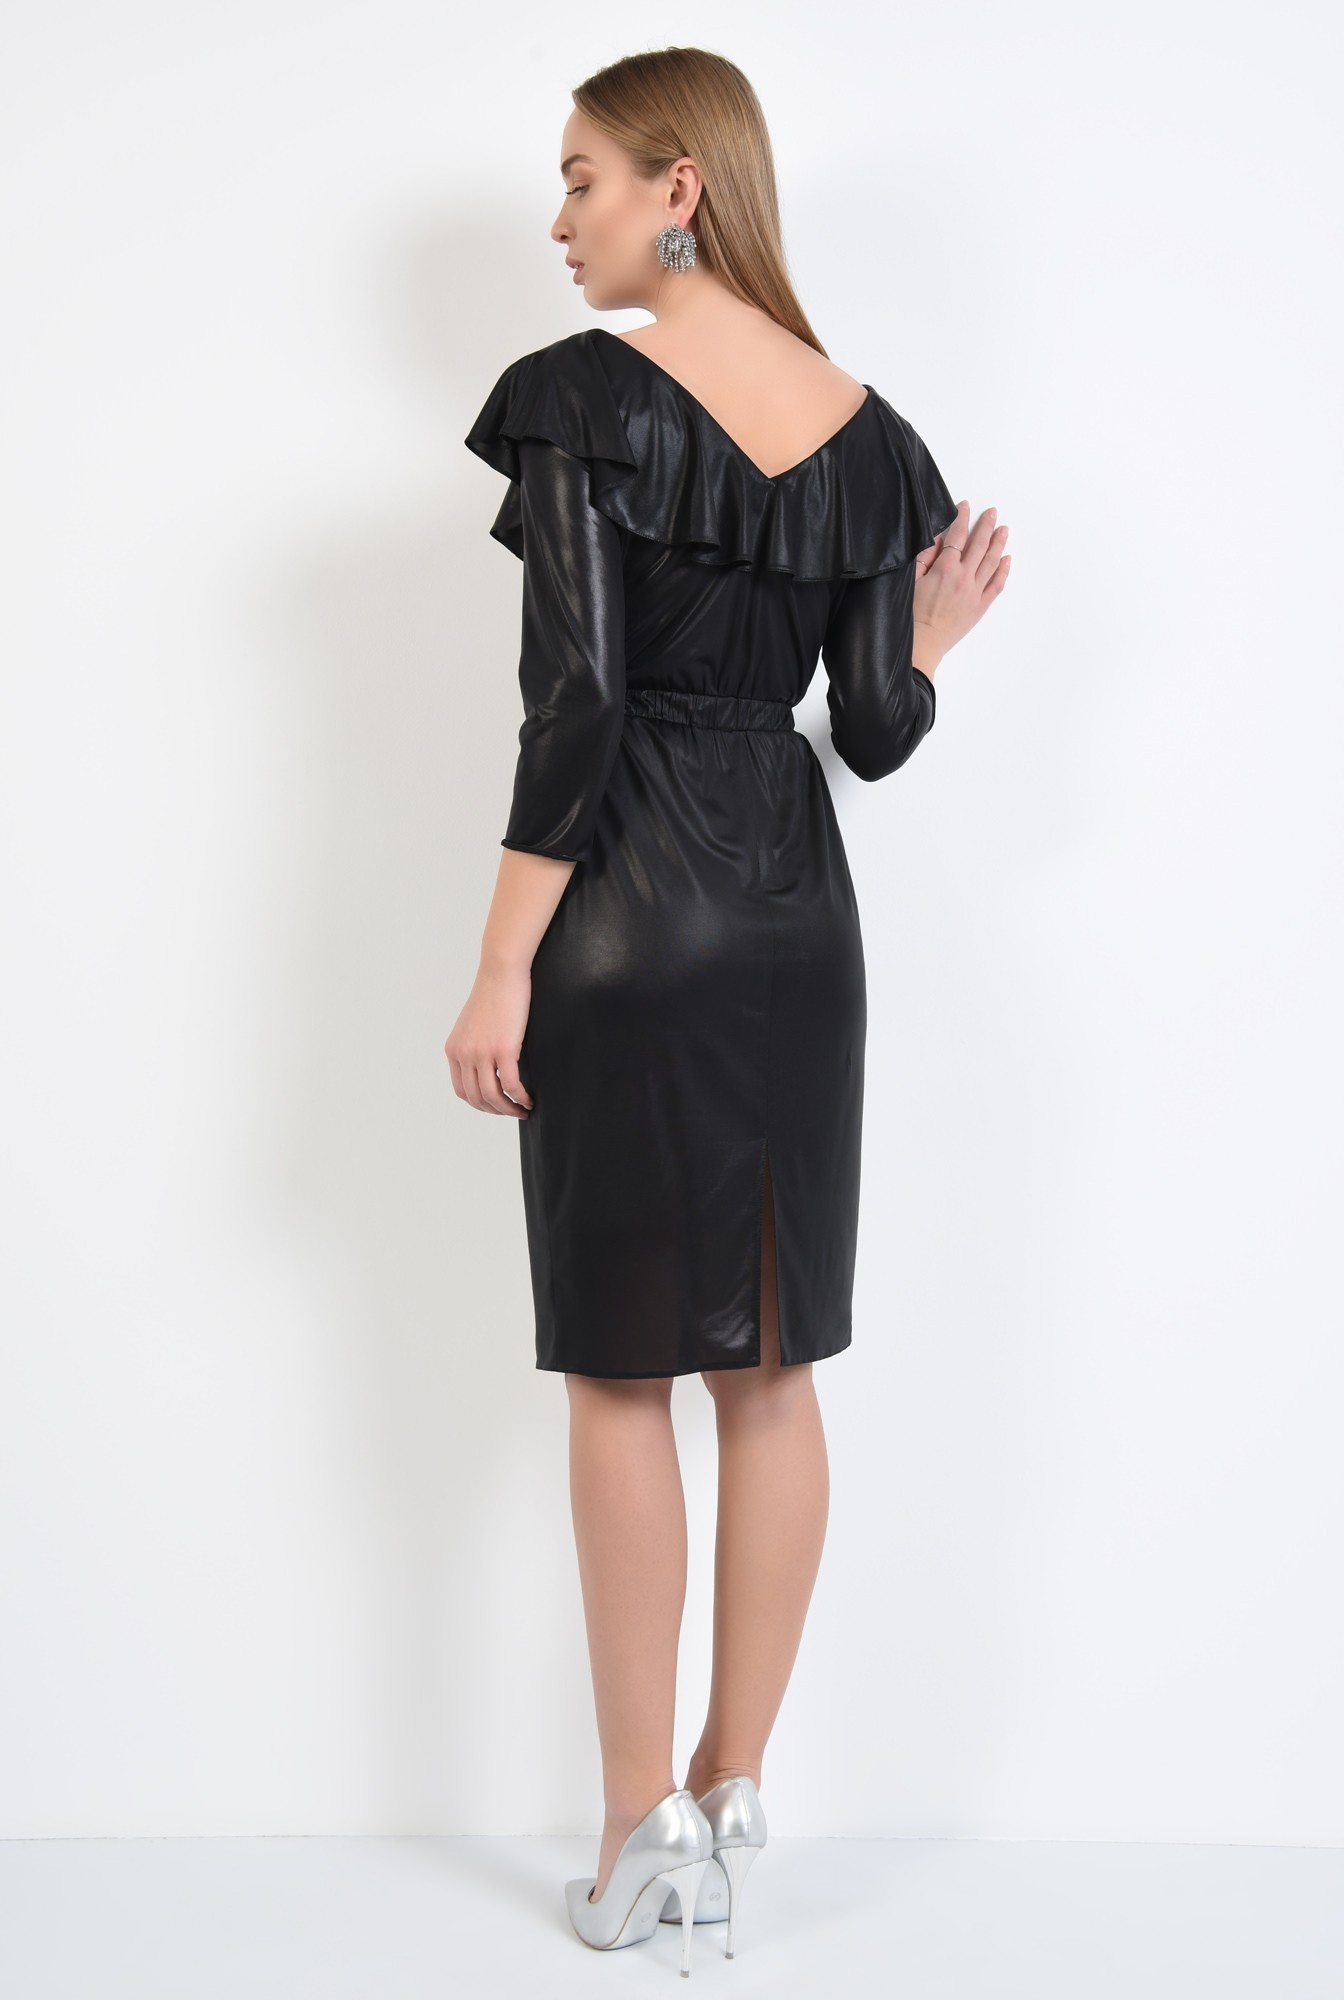 1 - rochie neagra, de ocazie, midi, cambrata cu elastic, cu volane